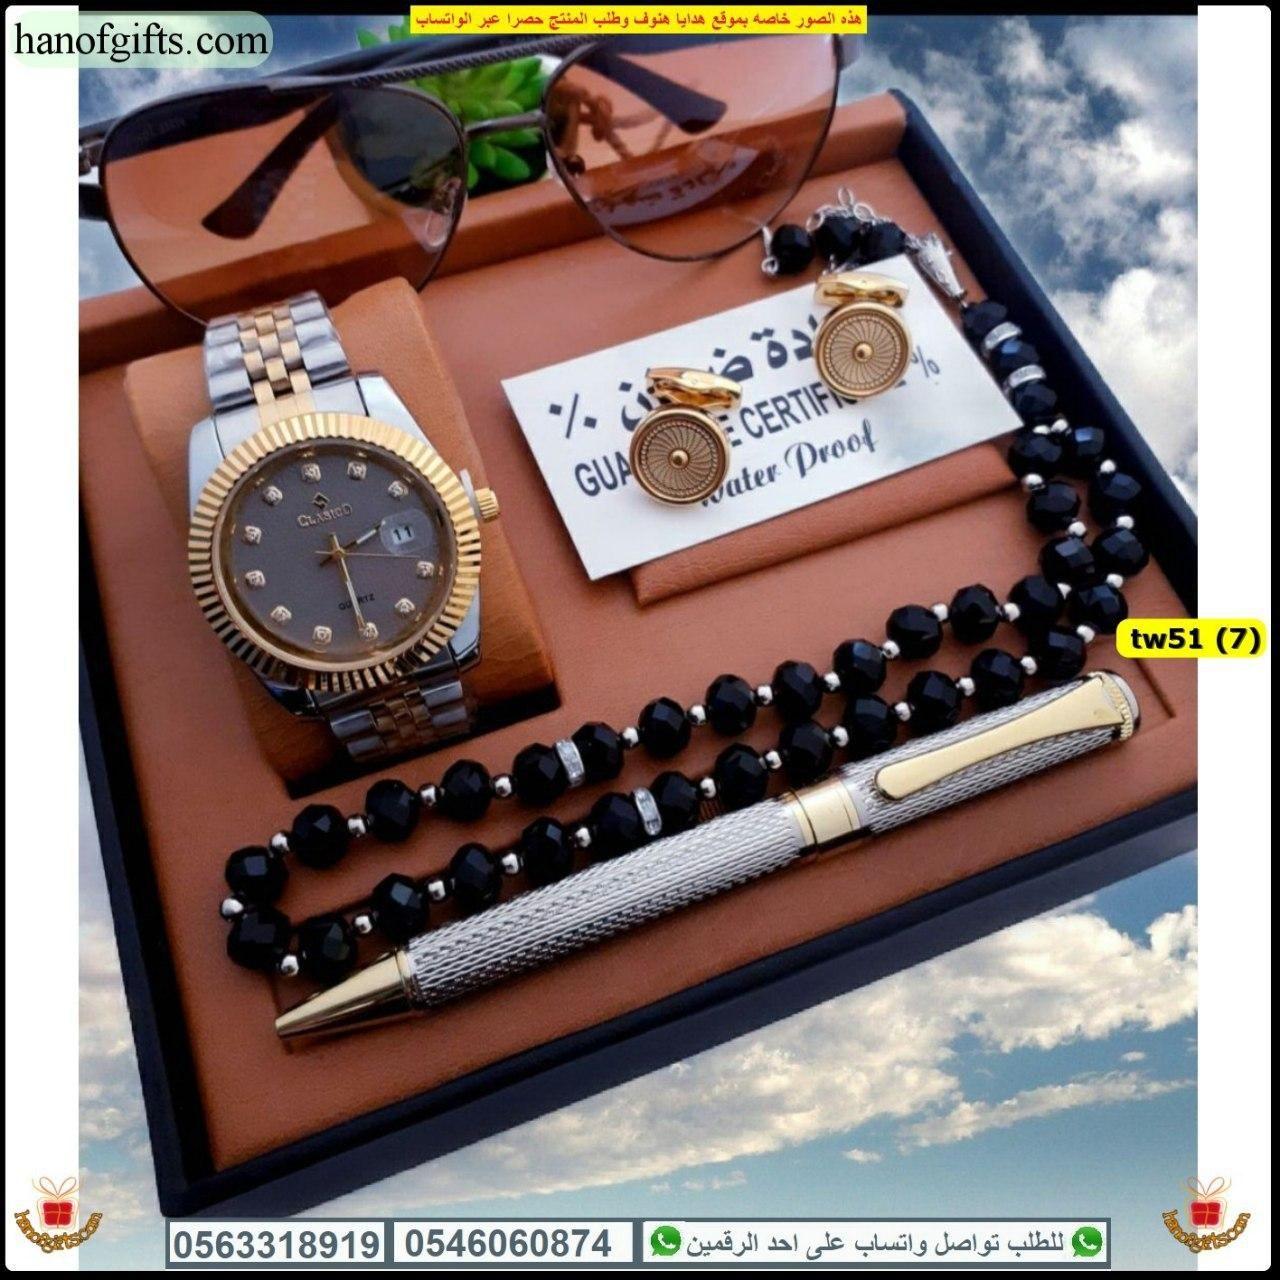 ساعات كلاسيك رجالي عرض خاص مع قلم وكبك ونظاره وسبحه وعلبة و ضمان سنه هدايا هنوف Rolex Watches Gold Watch Watches